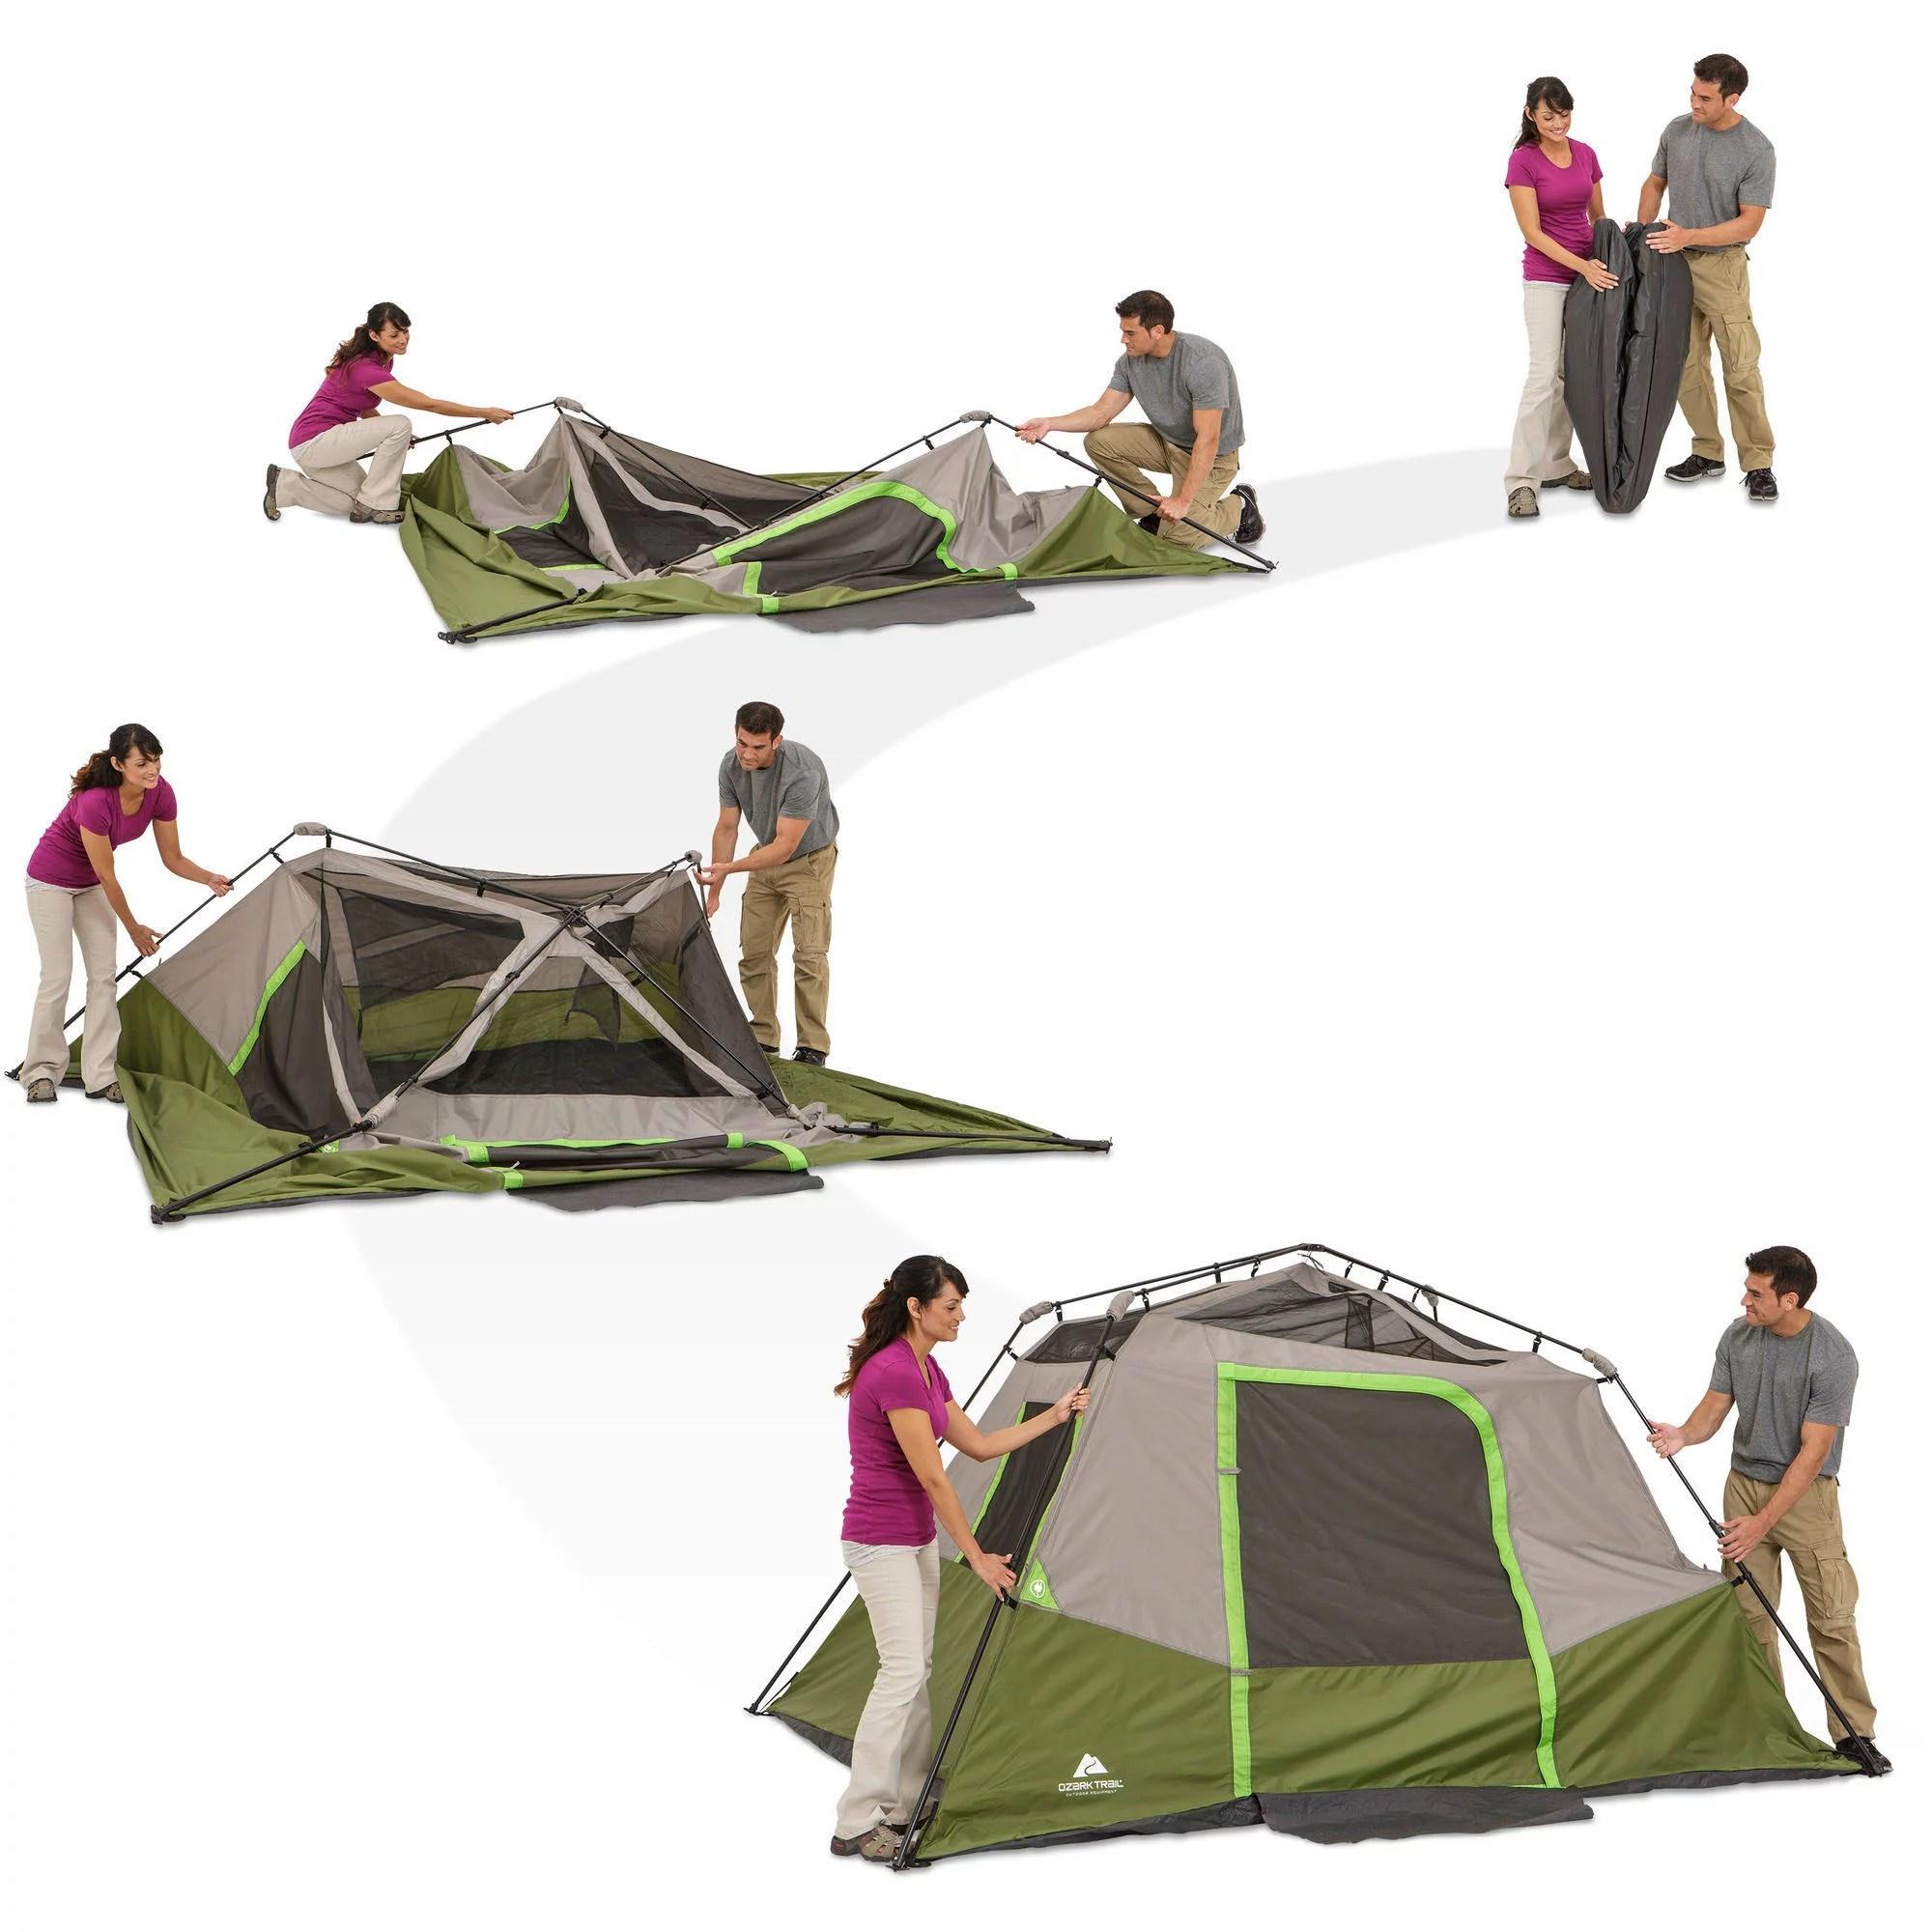 Coleman Bayside Tent Review Elite 6 8 Person Family Shelters  sc 1 st  Best Tent 2017 & Coleman Bayside 8 Person Tent Setup - Best Tent 2017